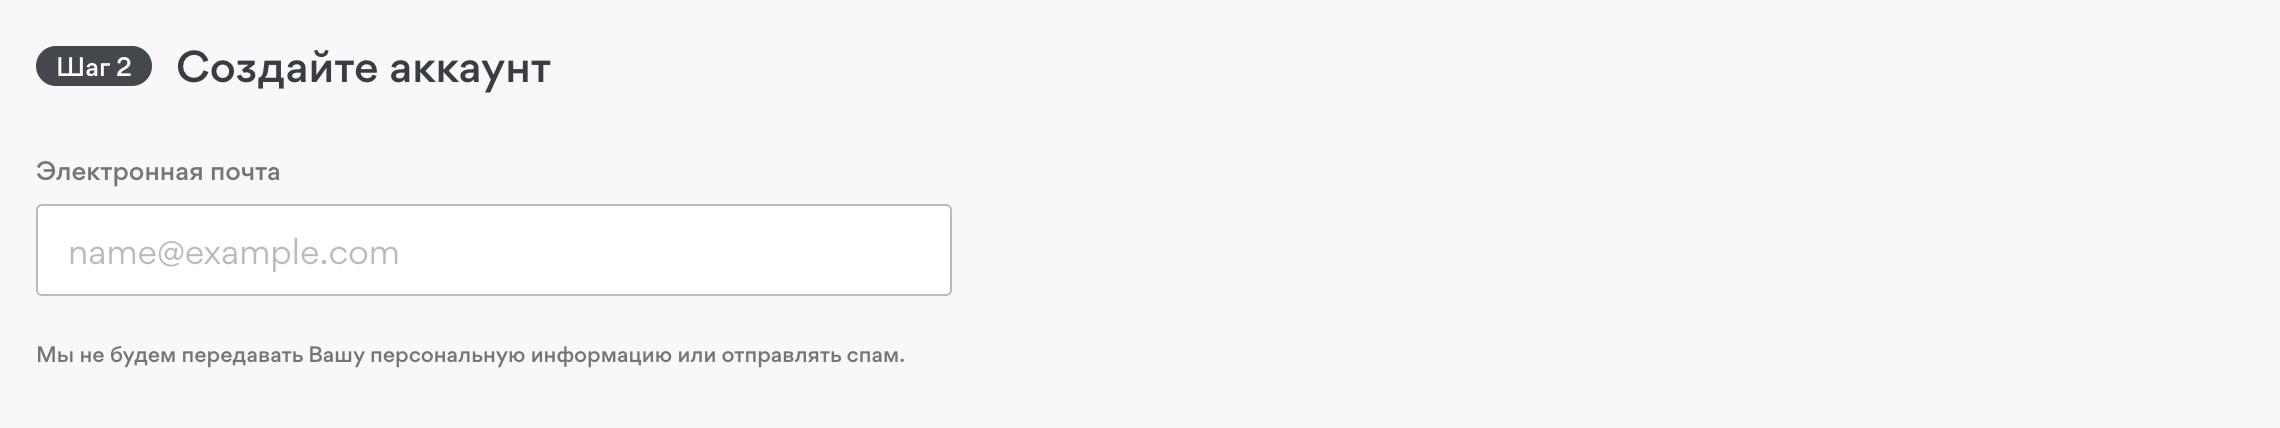 Screenshot of NordVPN account creation page